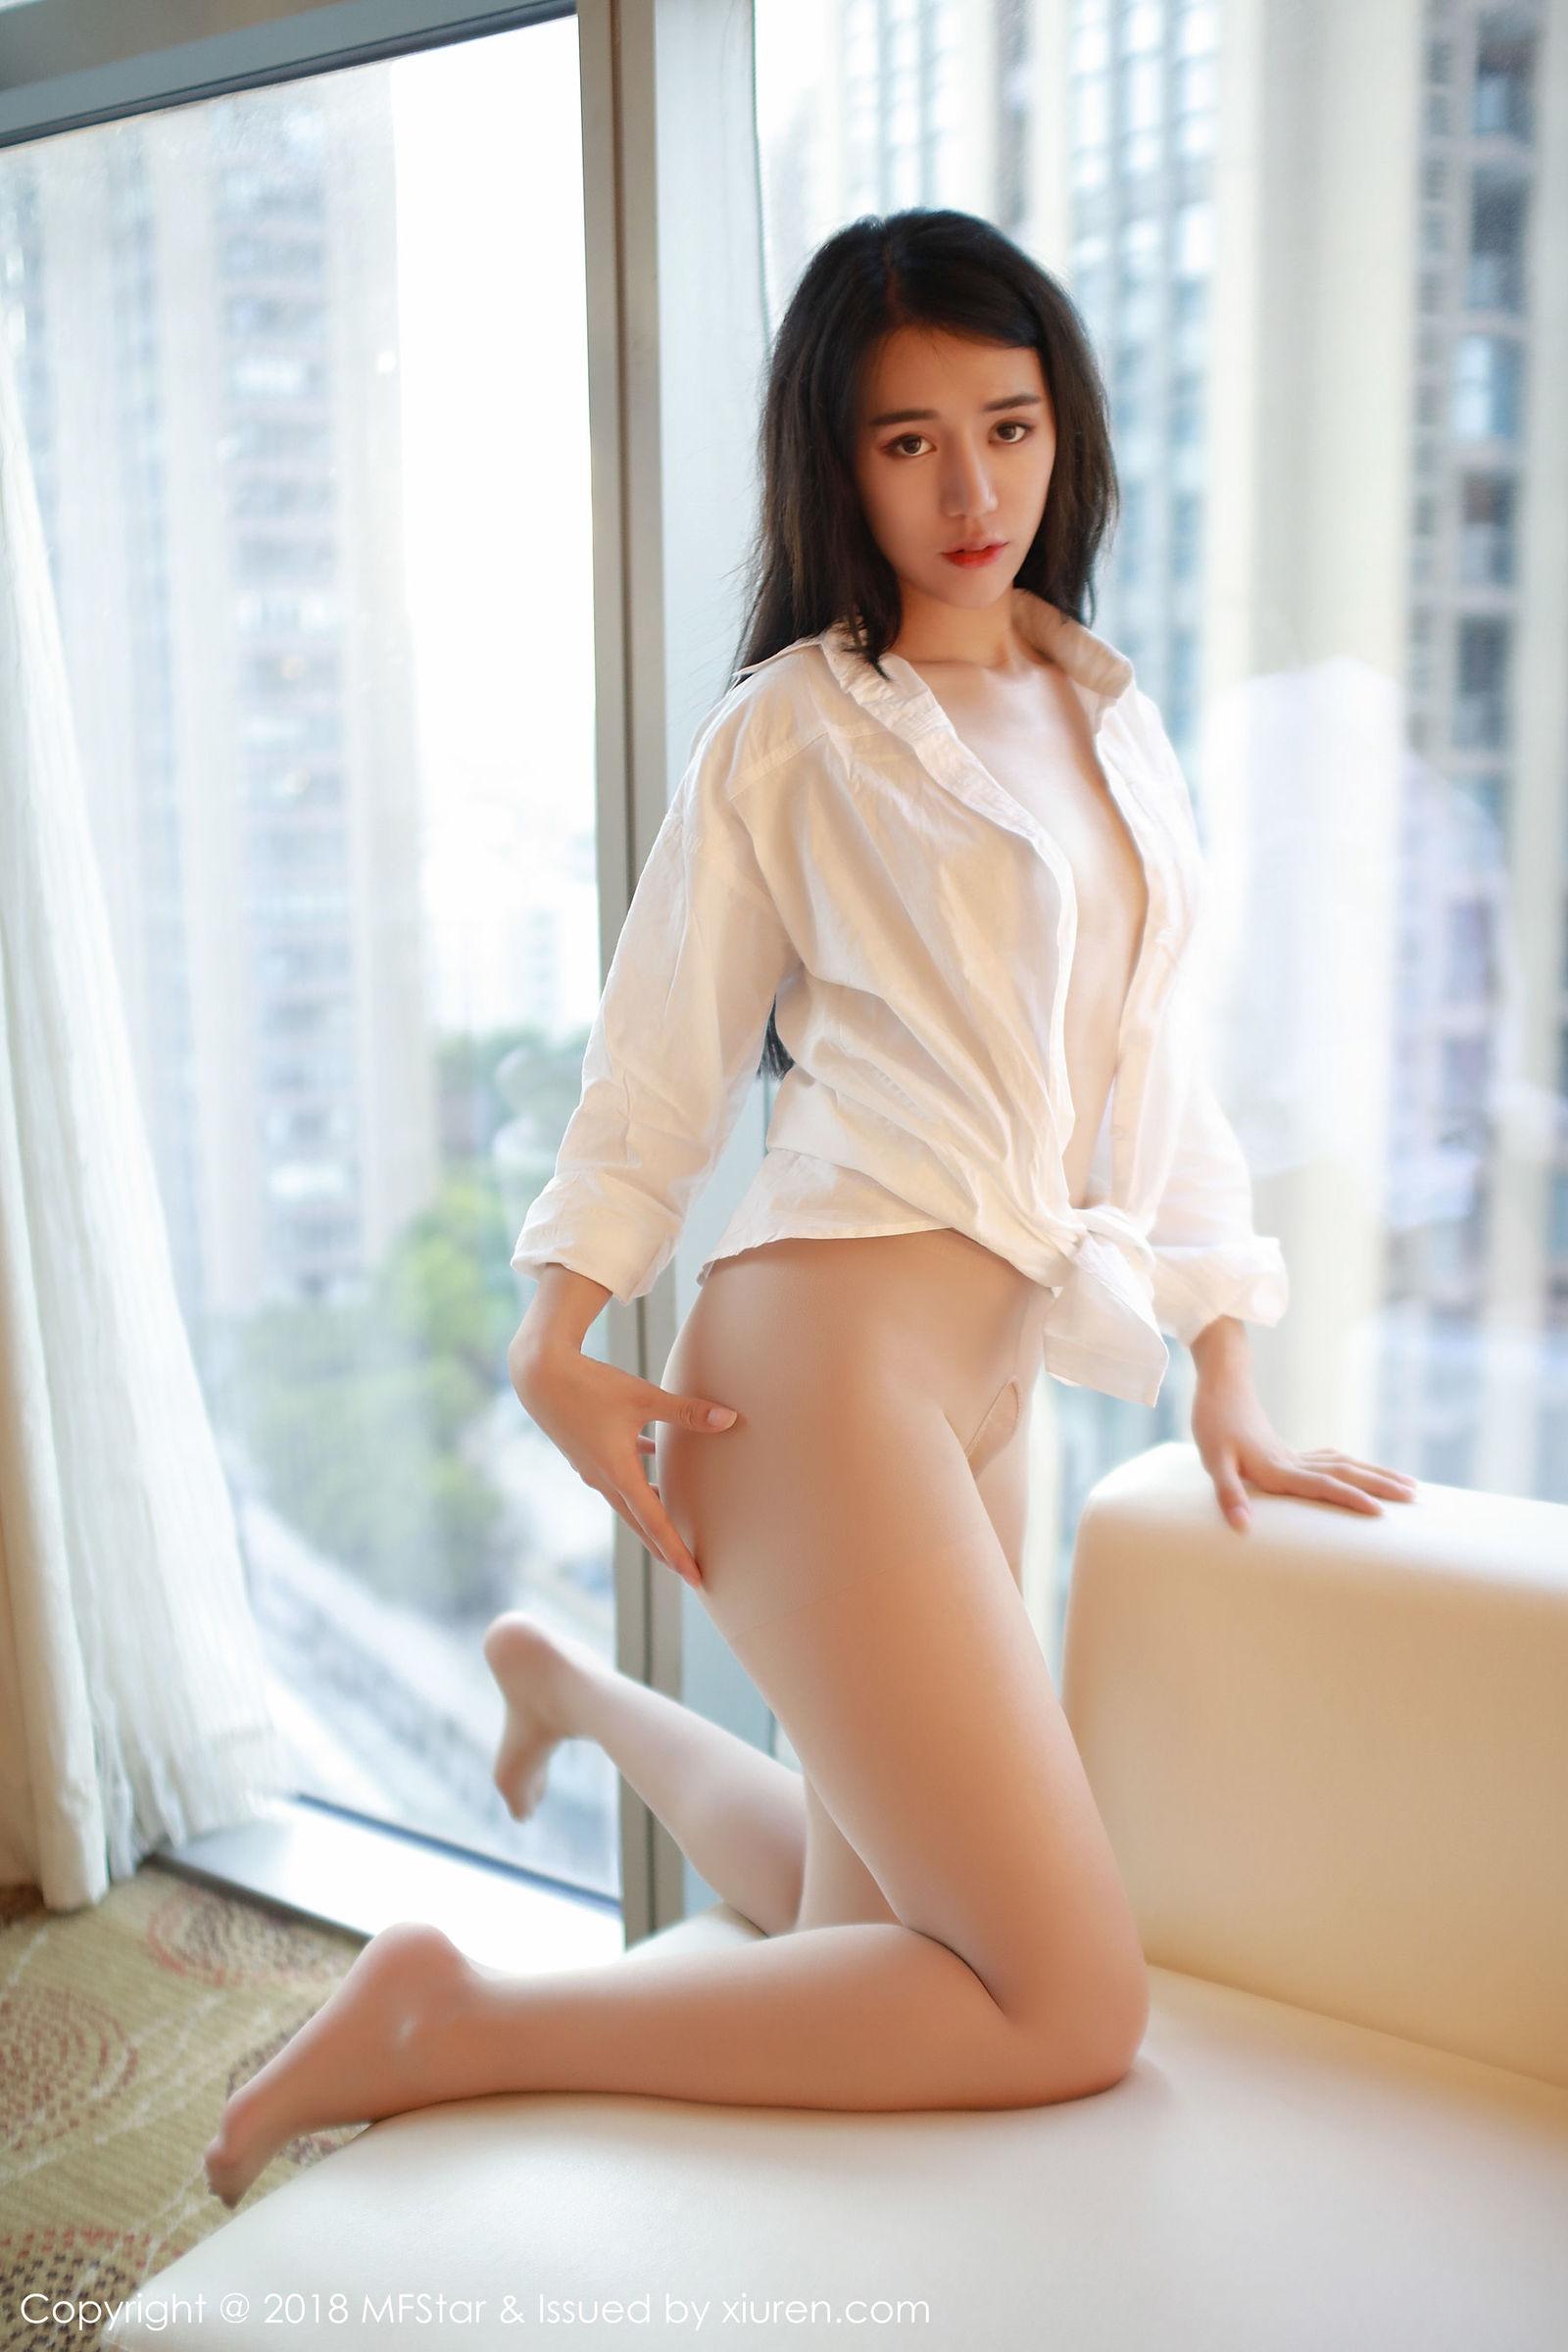 [MFStar模范学院] Vol.143 模特@白子嫣nicky首套丝袜美图[35P]